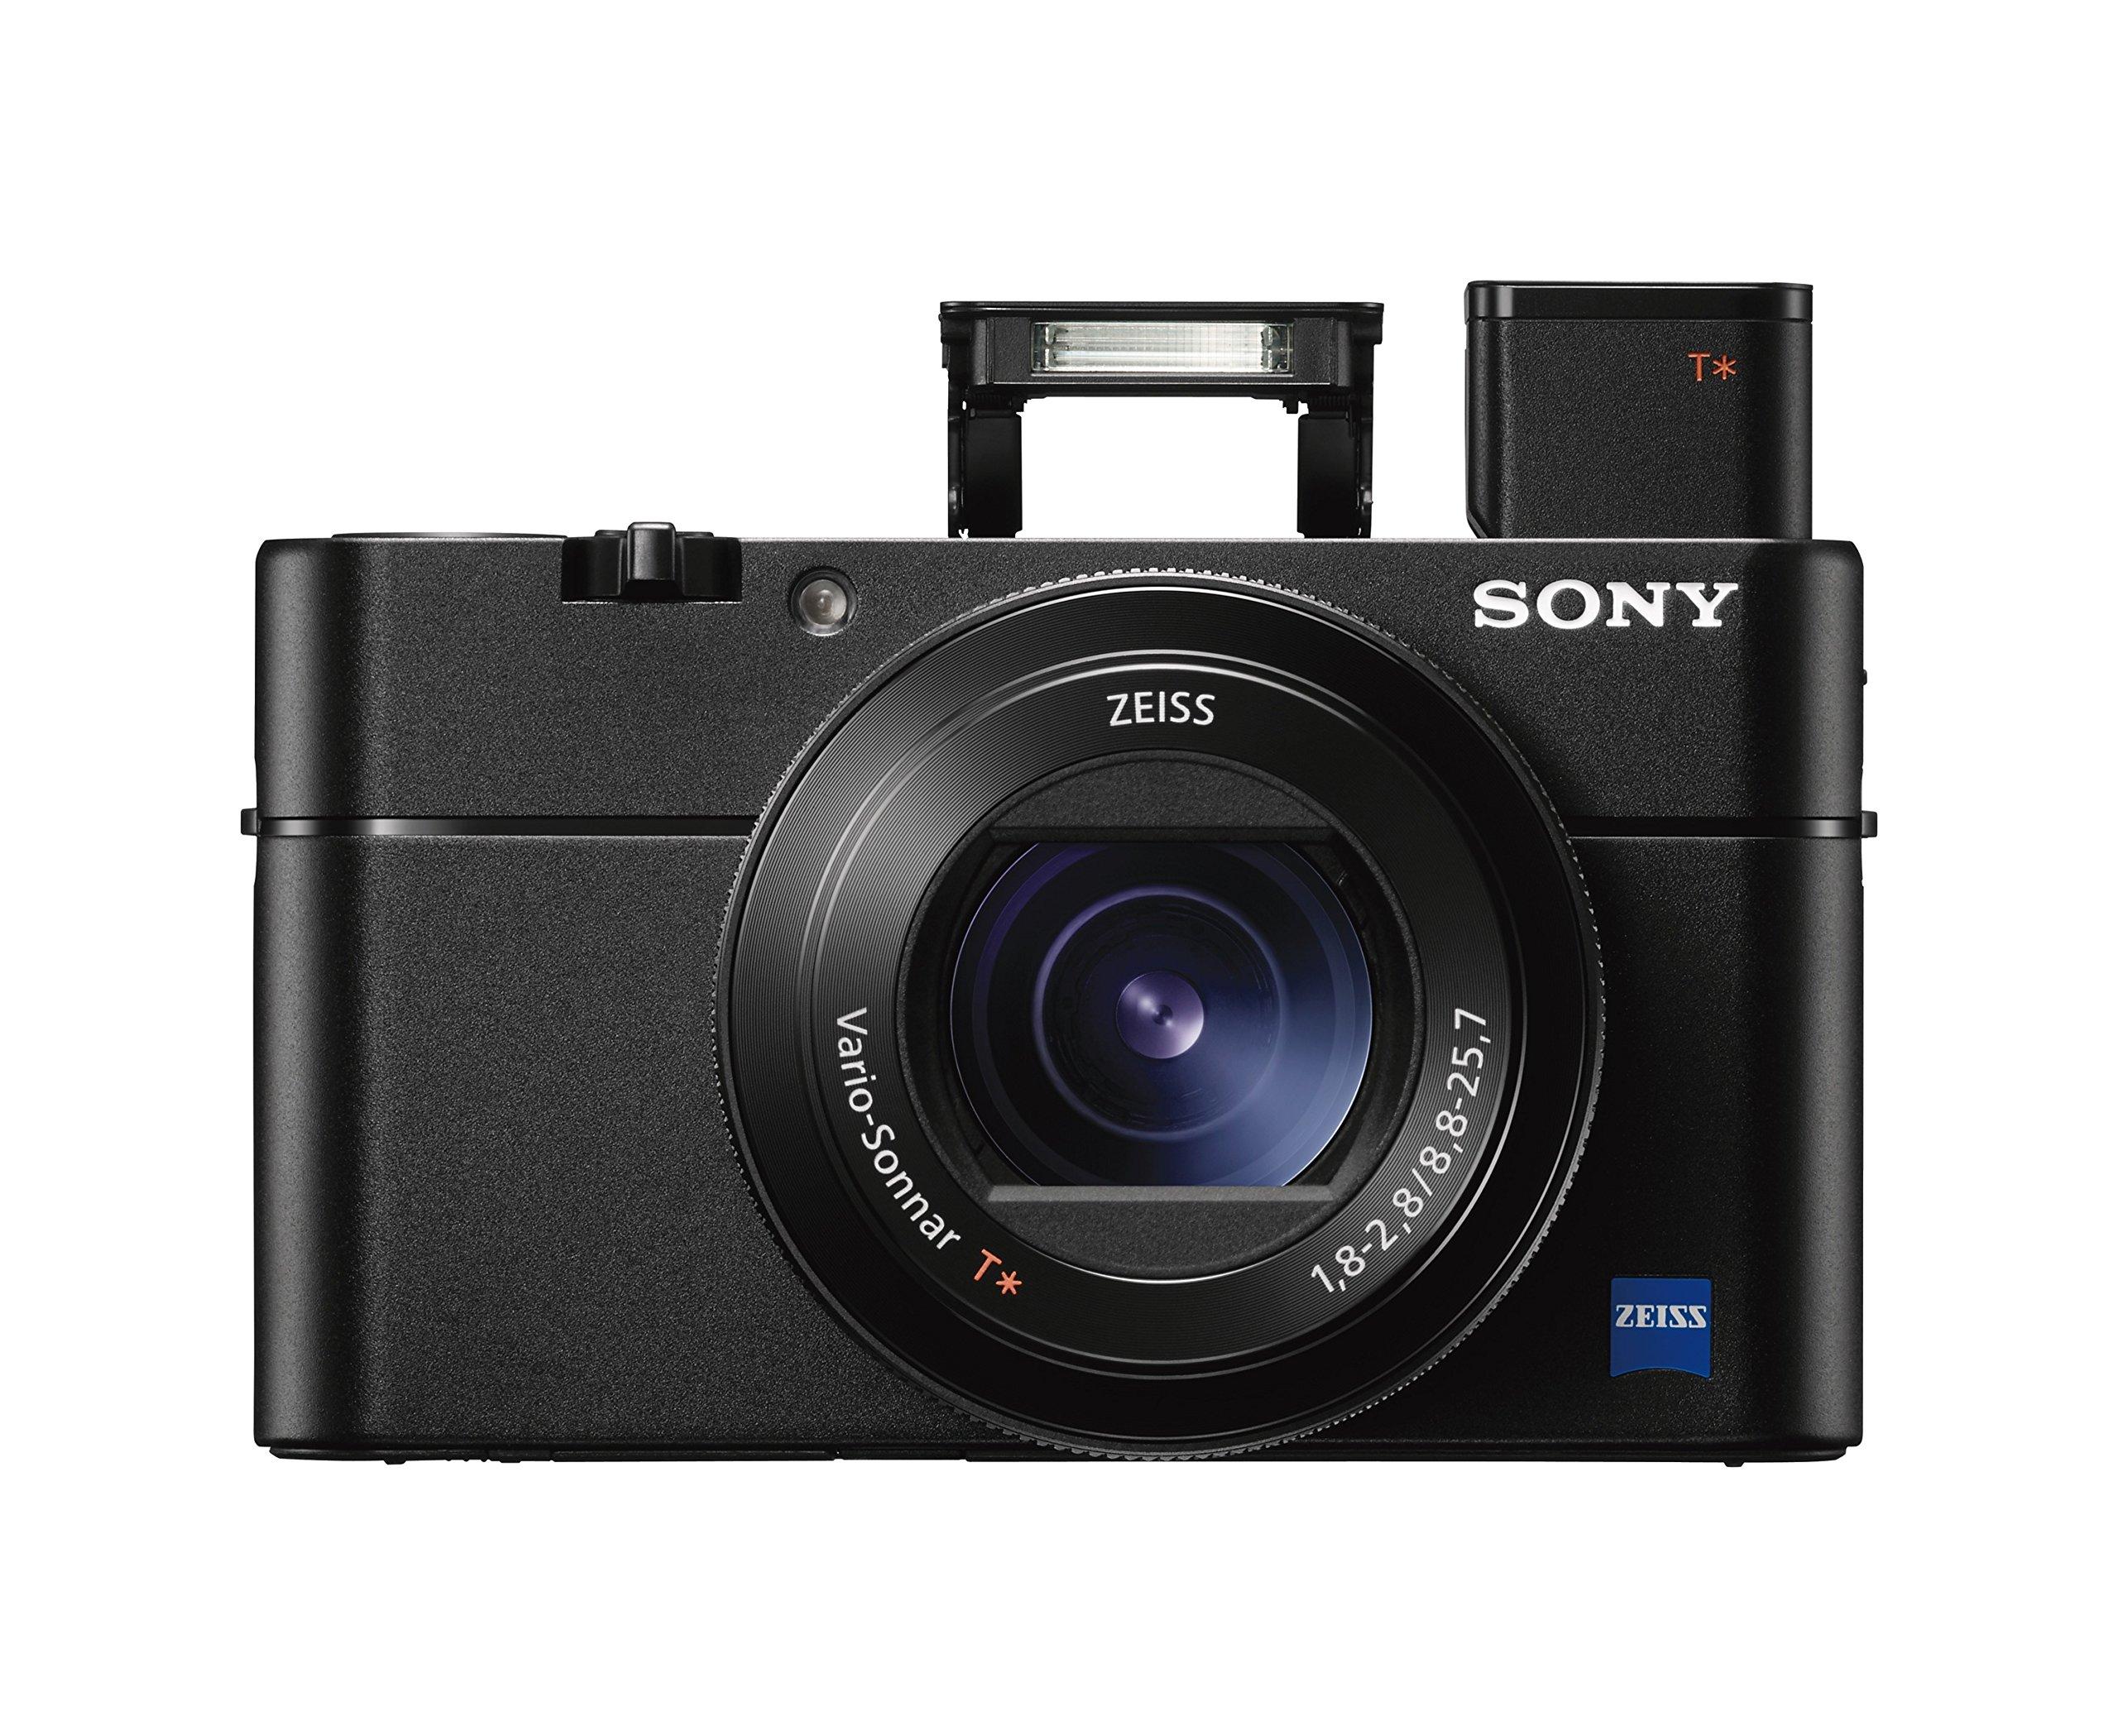 "Sony Cyber-shot DSC-RX100 V 20.1 MP Digital Still Camera with 3'' OLED, flip screen, WiFi, and 1"" sensor"